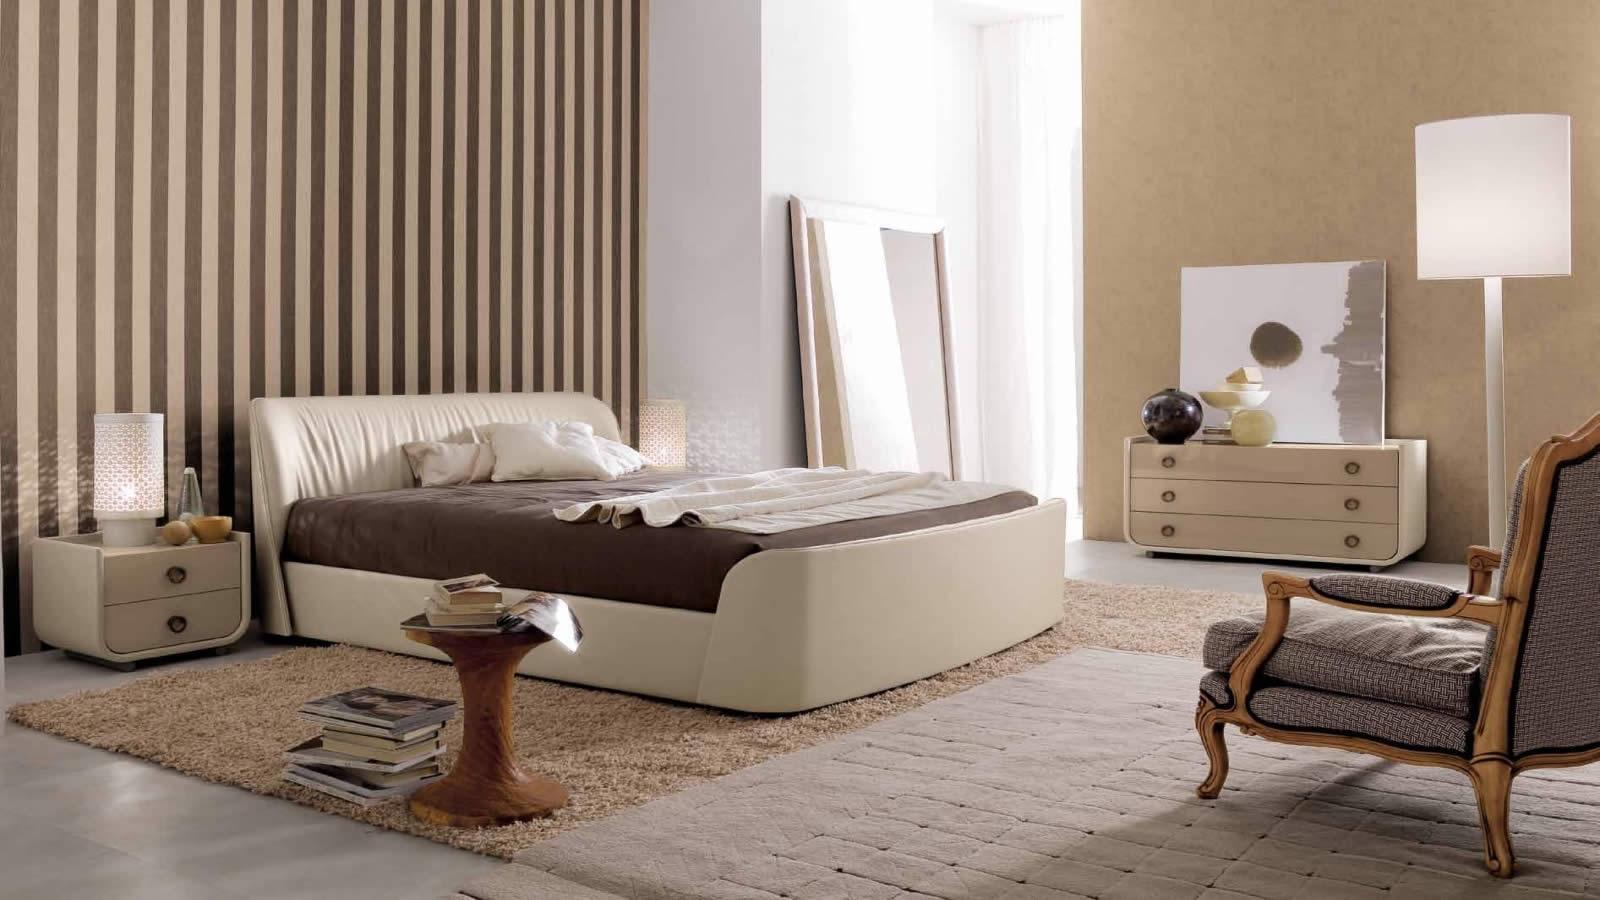 Amazoncom shag carpet cleaner